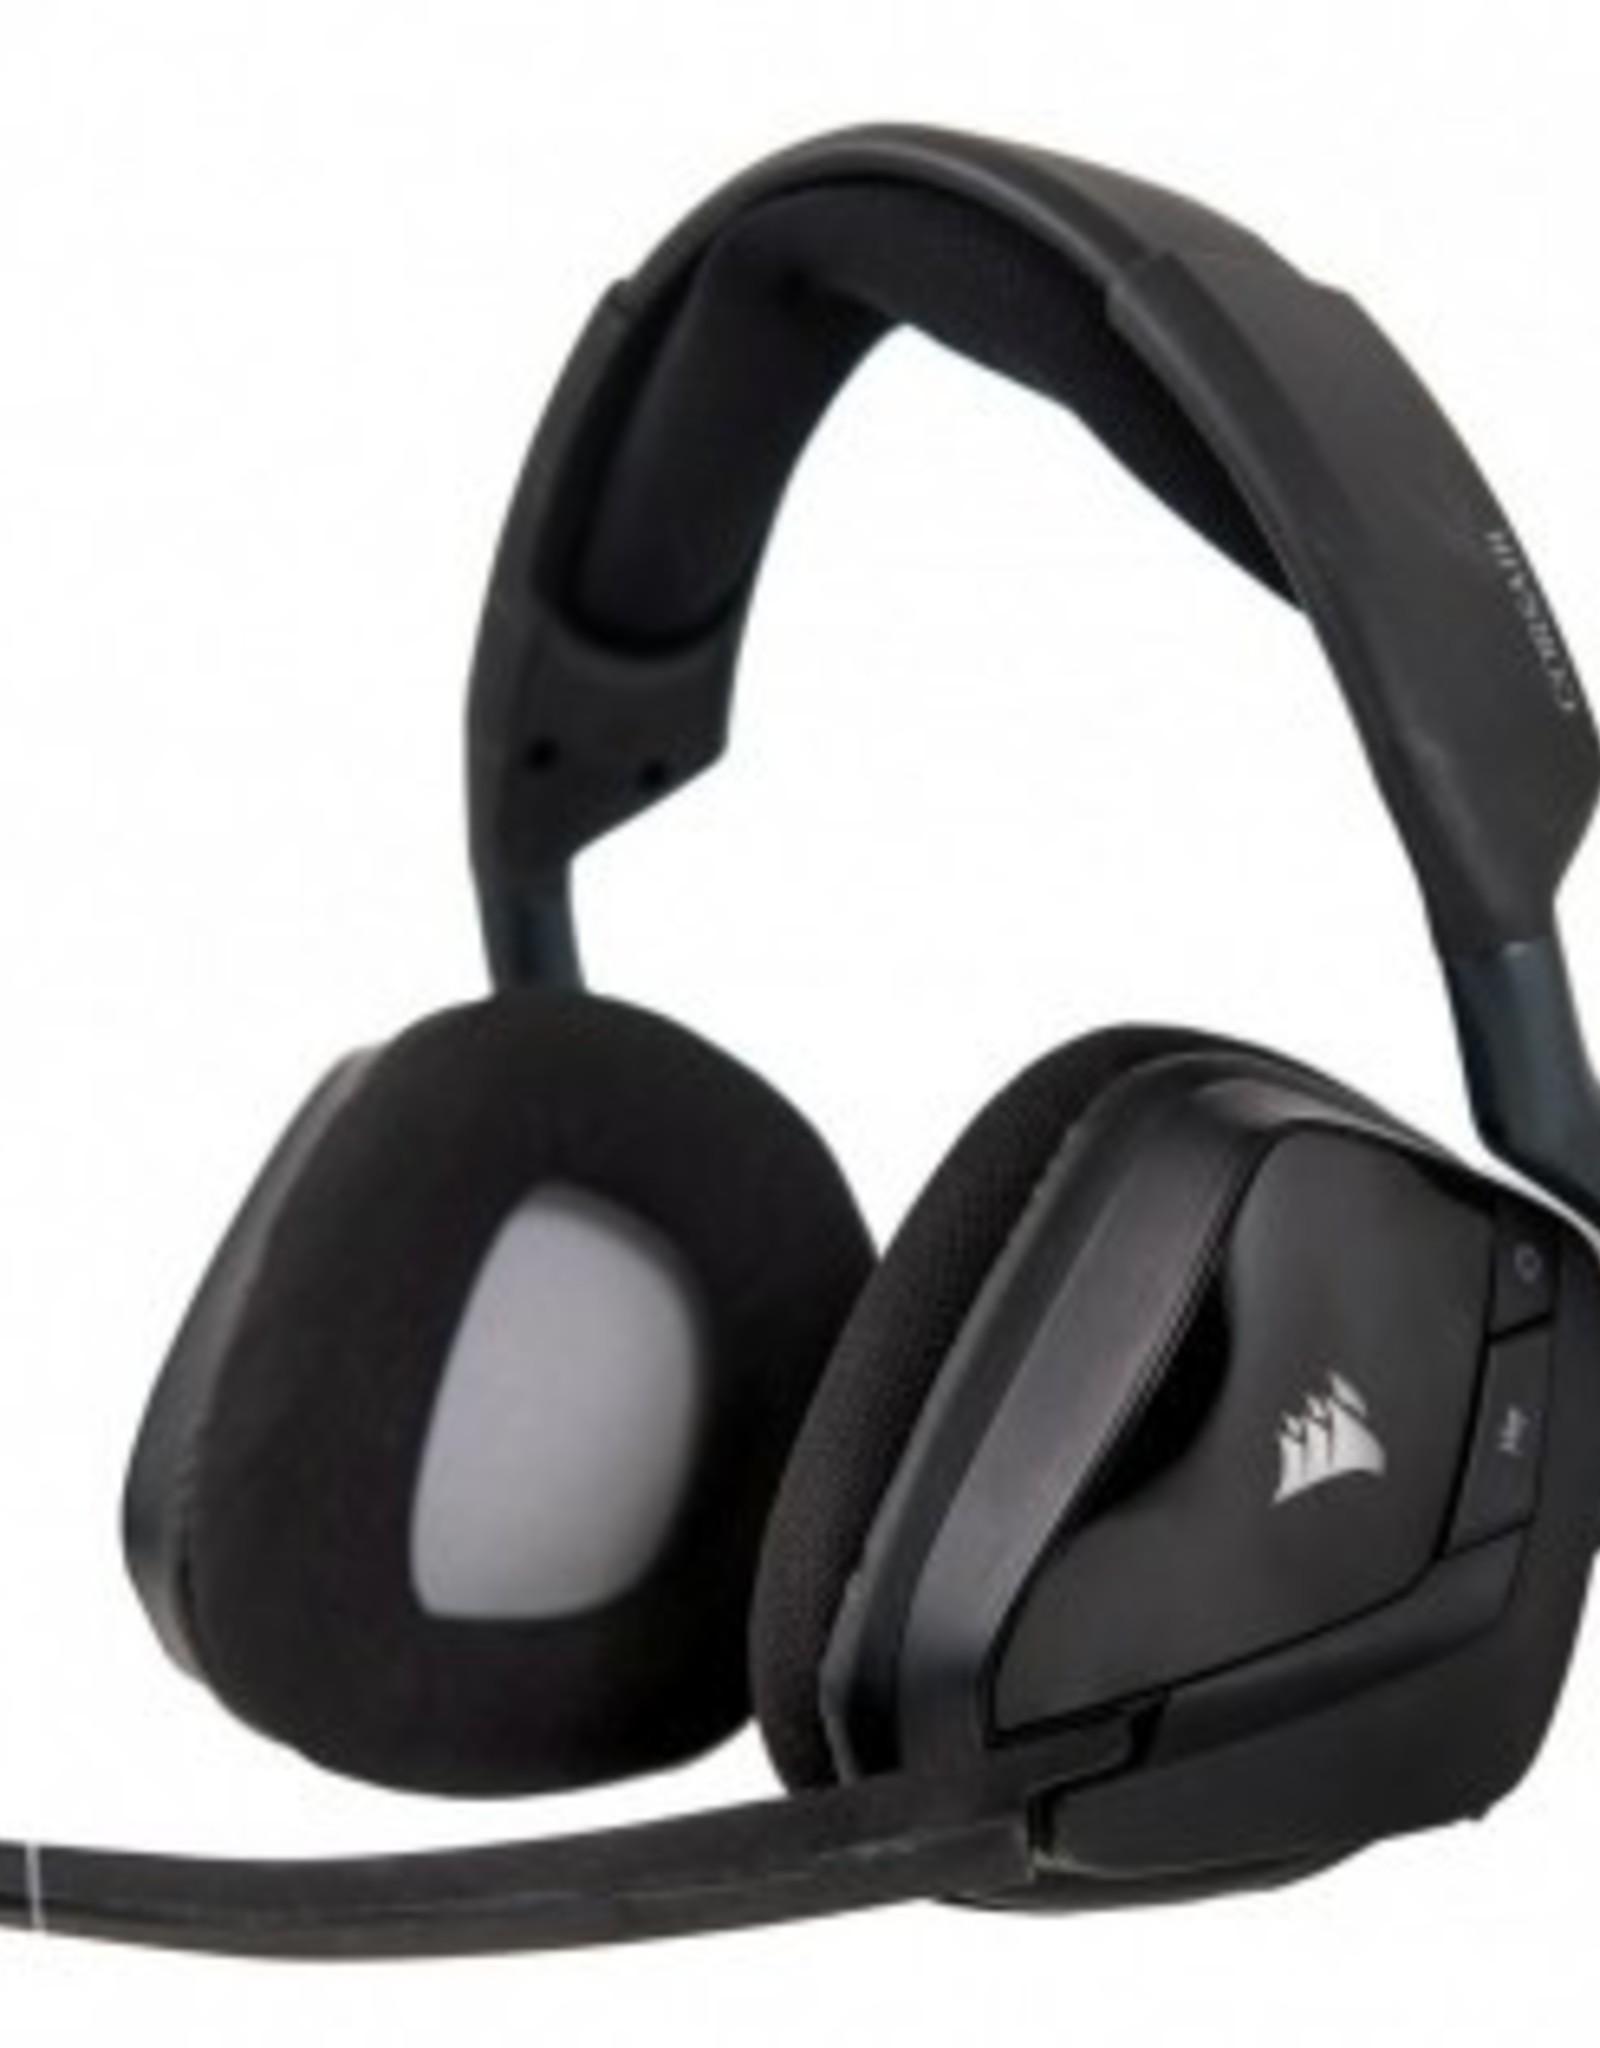 Corsair Corsair Gaming VOID PRO RGB Wireless Premium Gaming Headset with Dolby Headphone 7.1 Black CA-9011152-NA